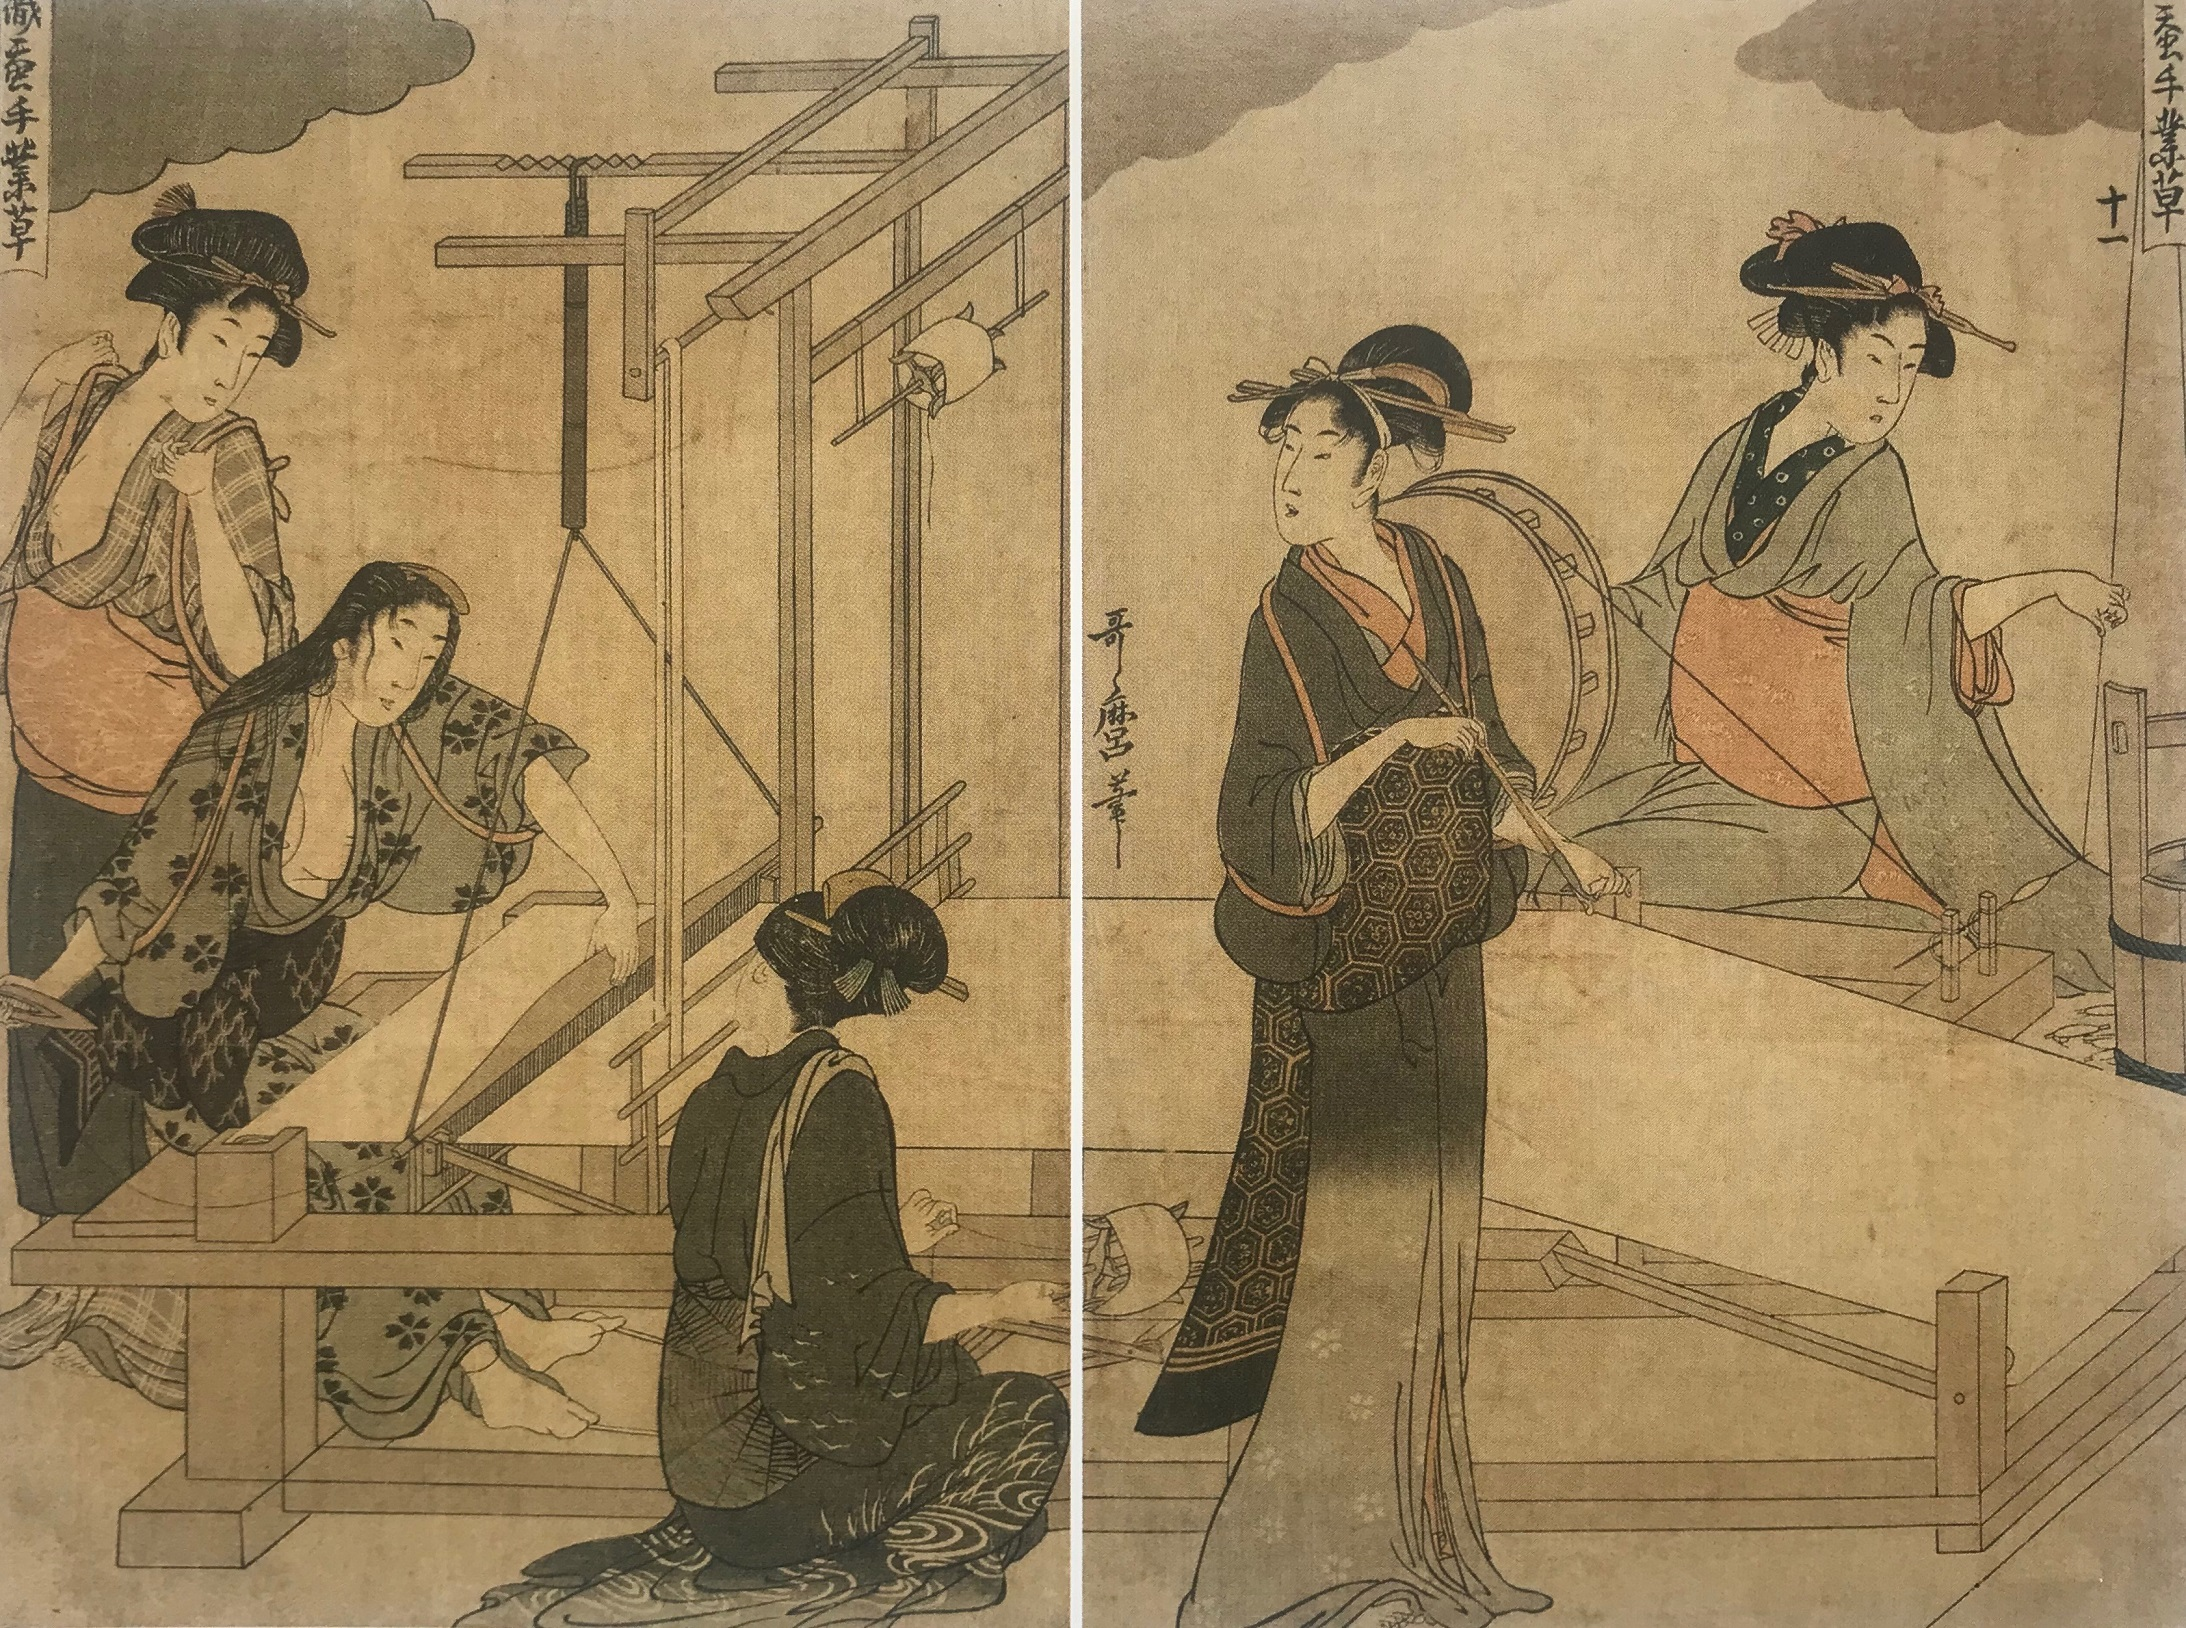 Utamaro La tessitura, 1800